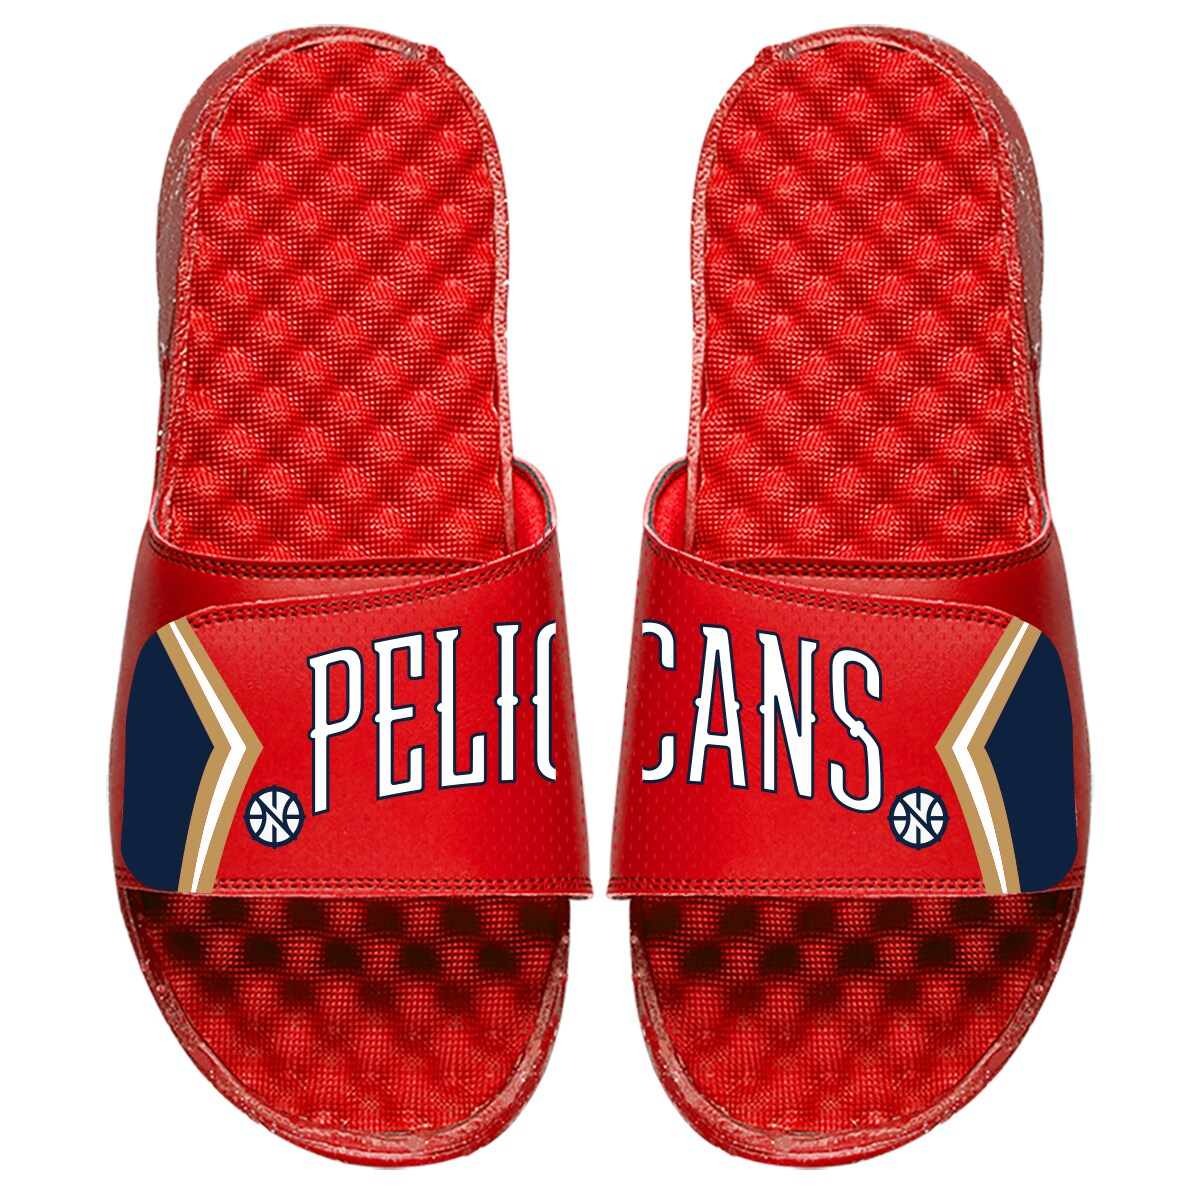 New Orleans Pelicans ISlide Statement Jersey Split Slide Sandals - Red